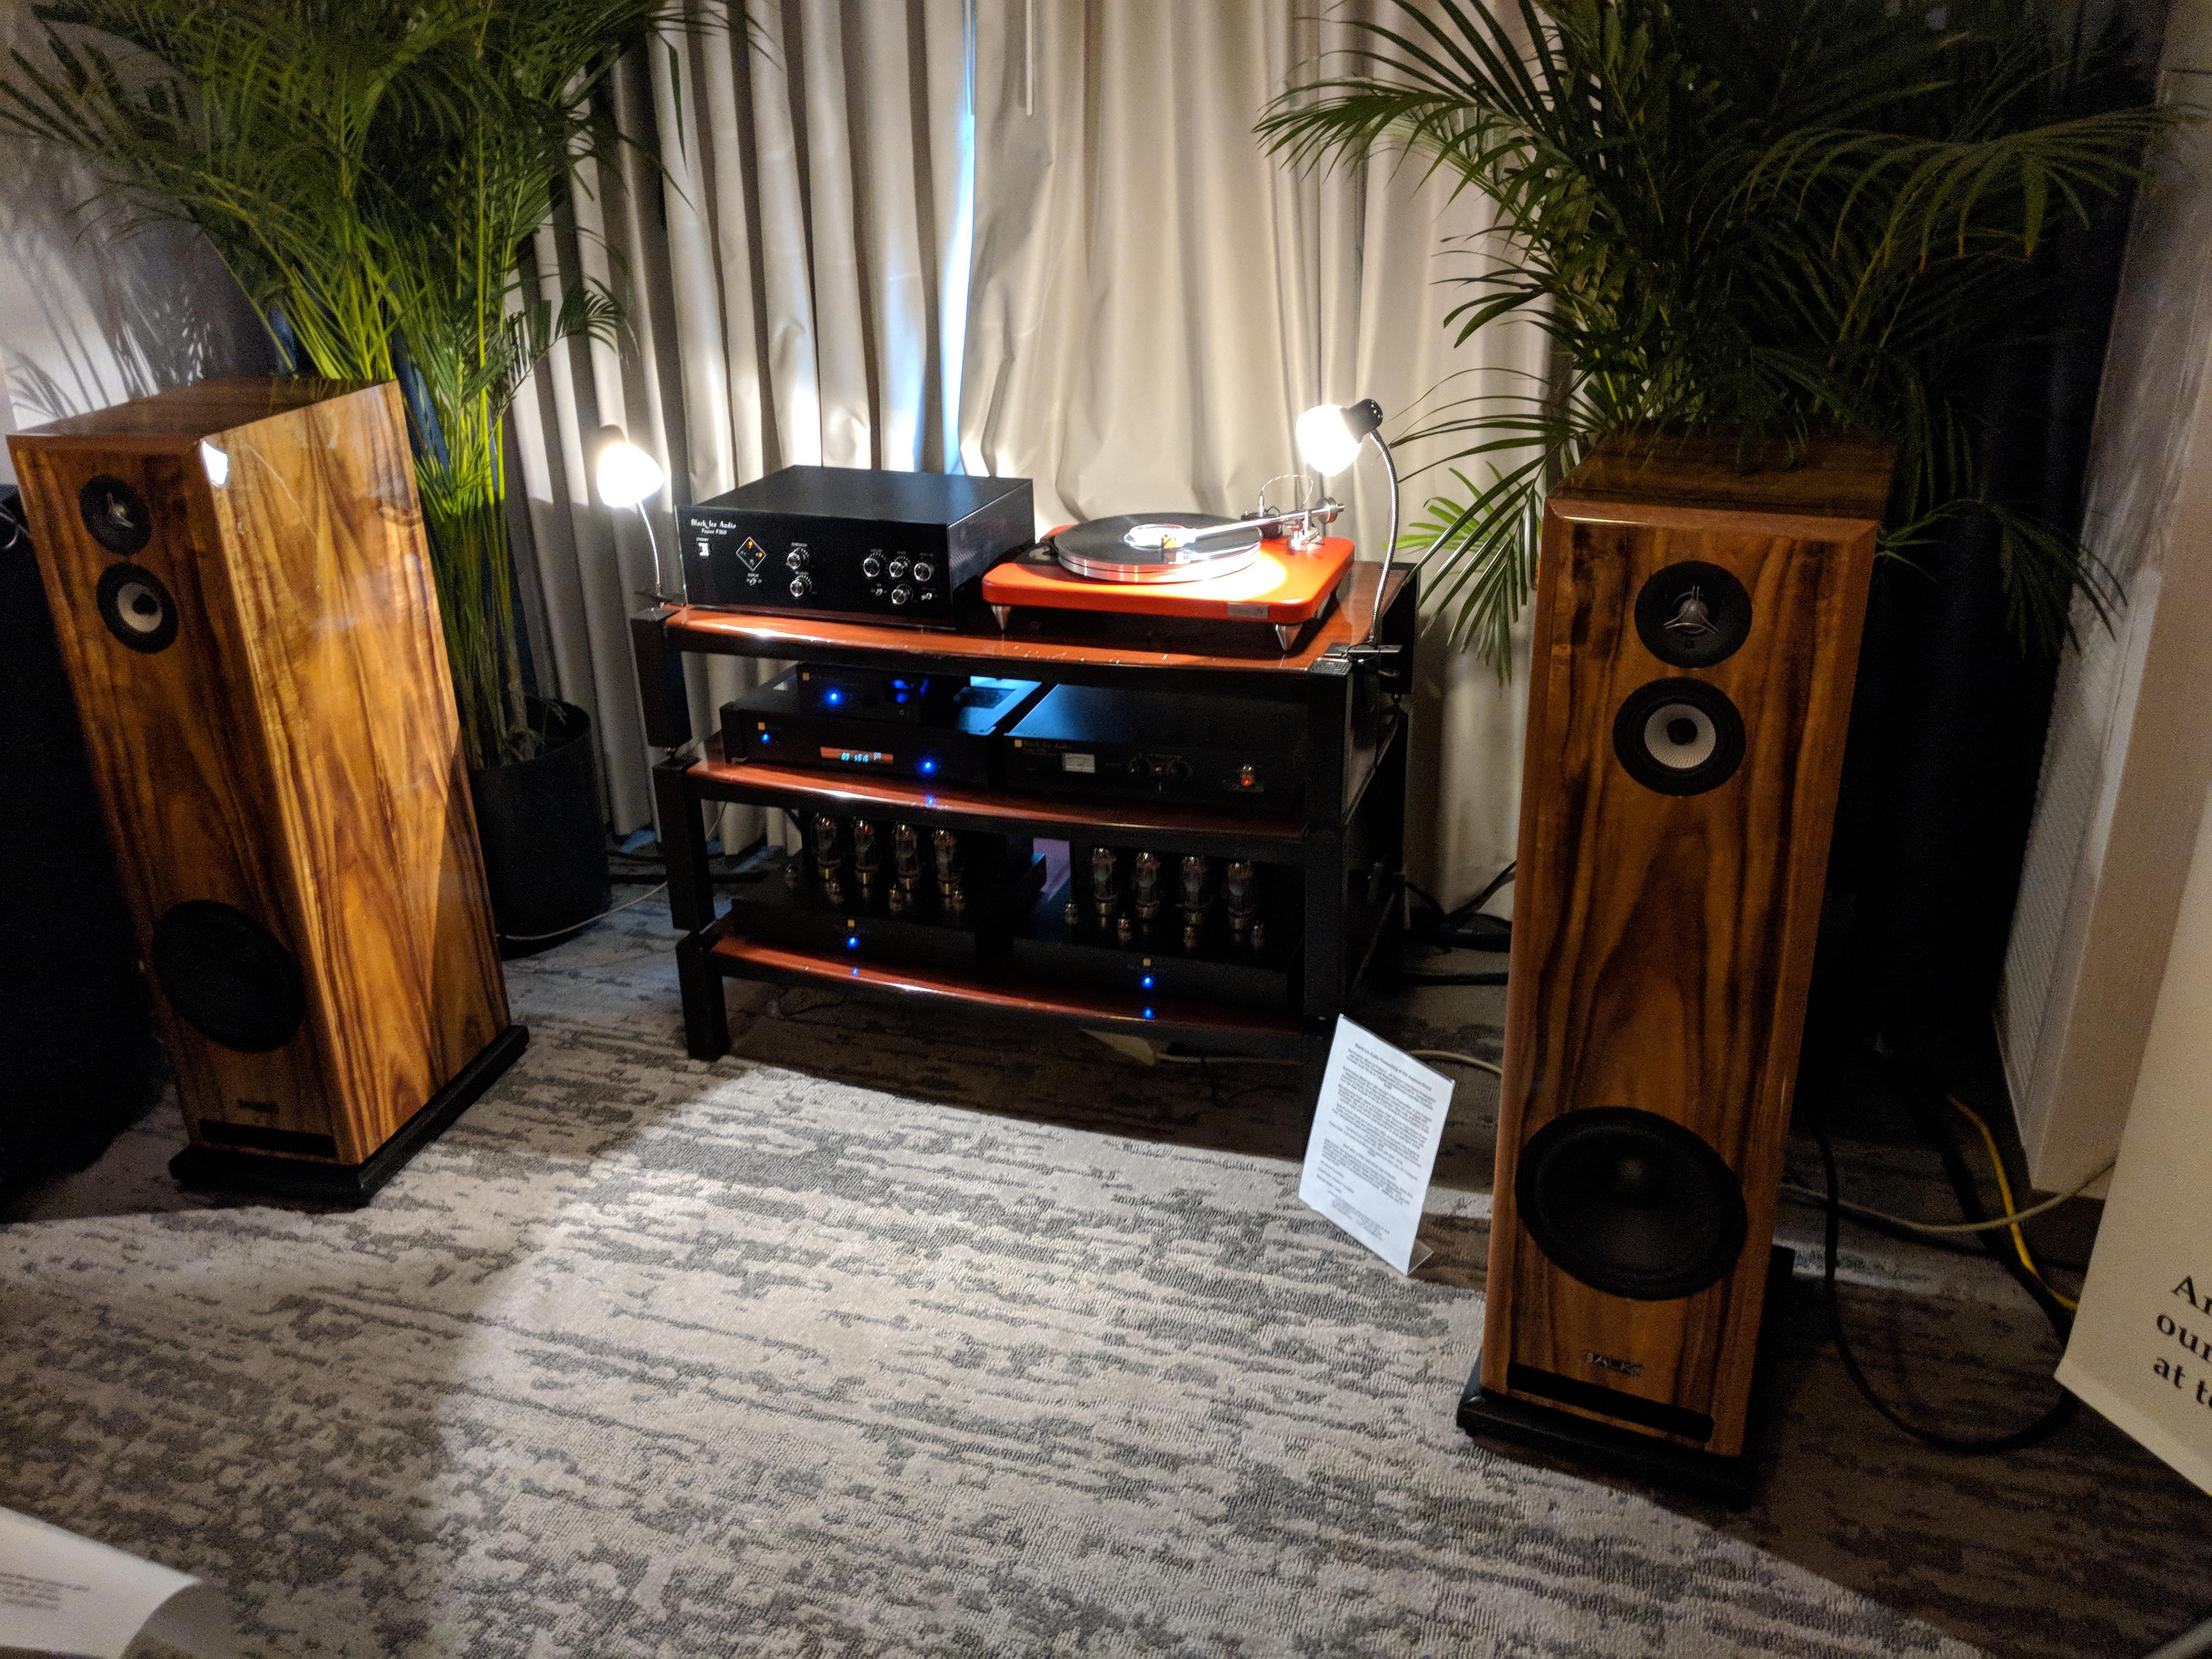 Jolida (Black Ice Audio) – Axpona 2018